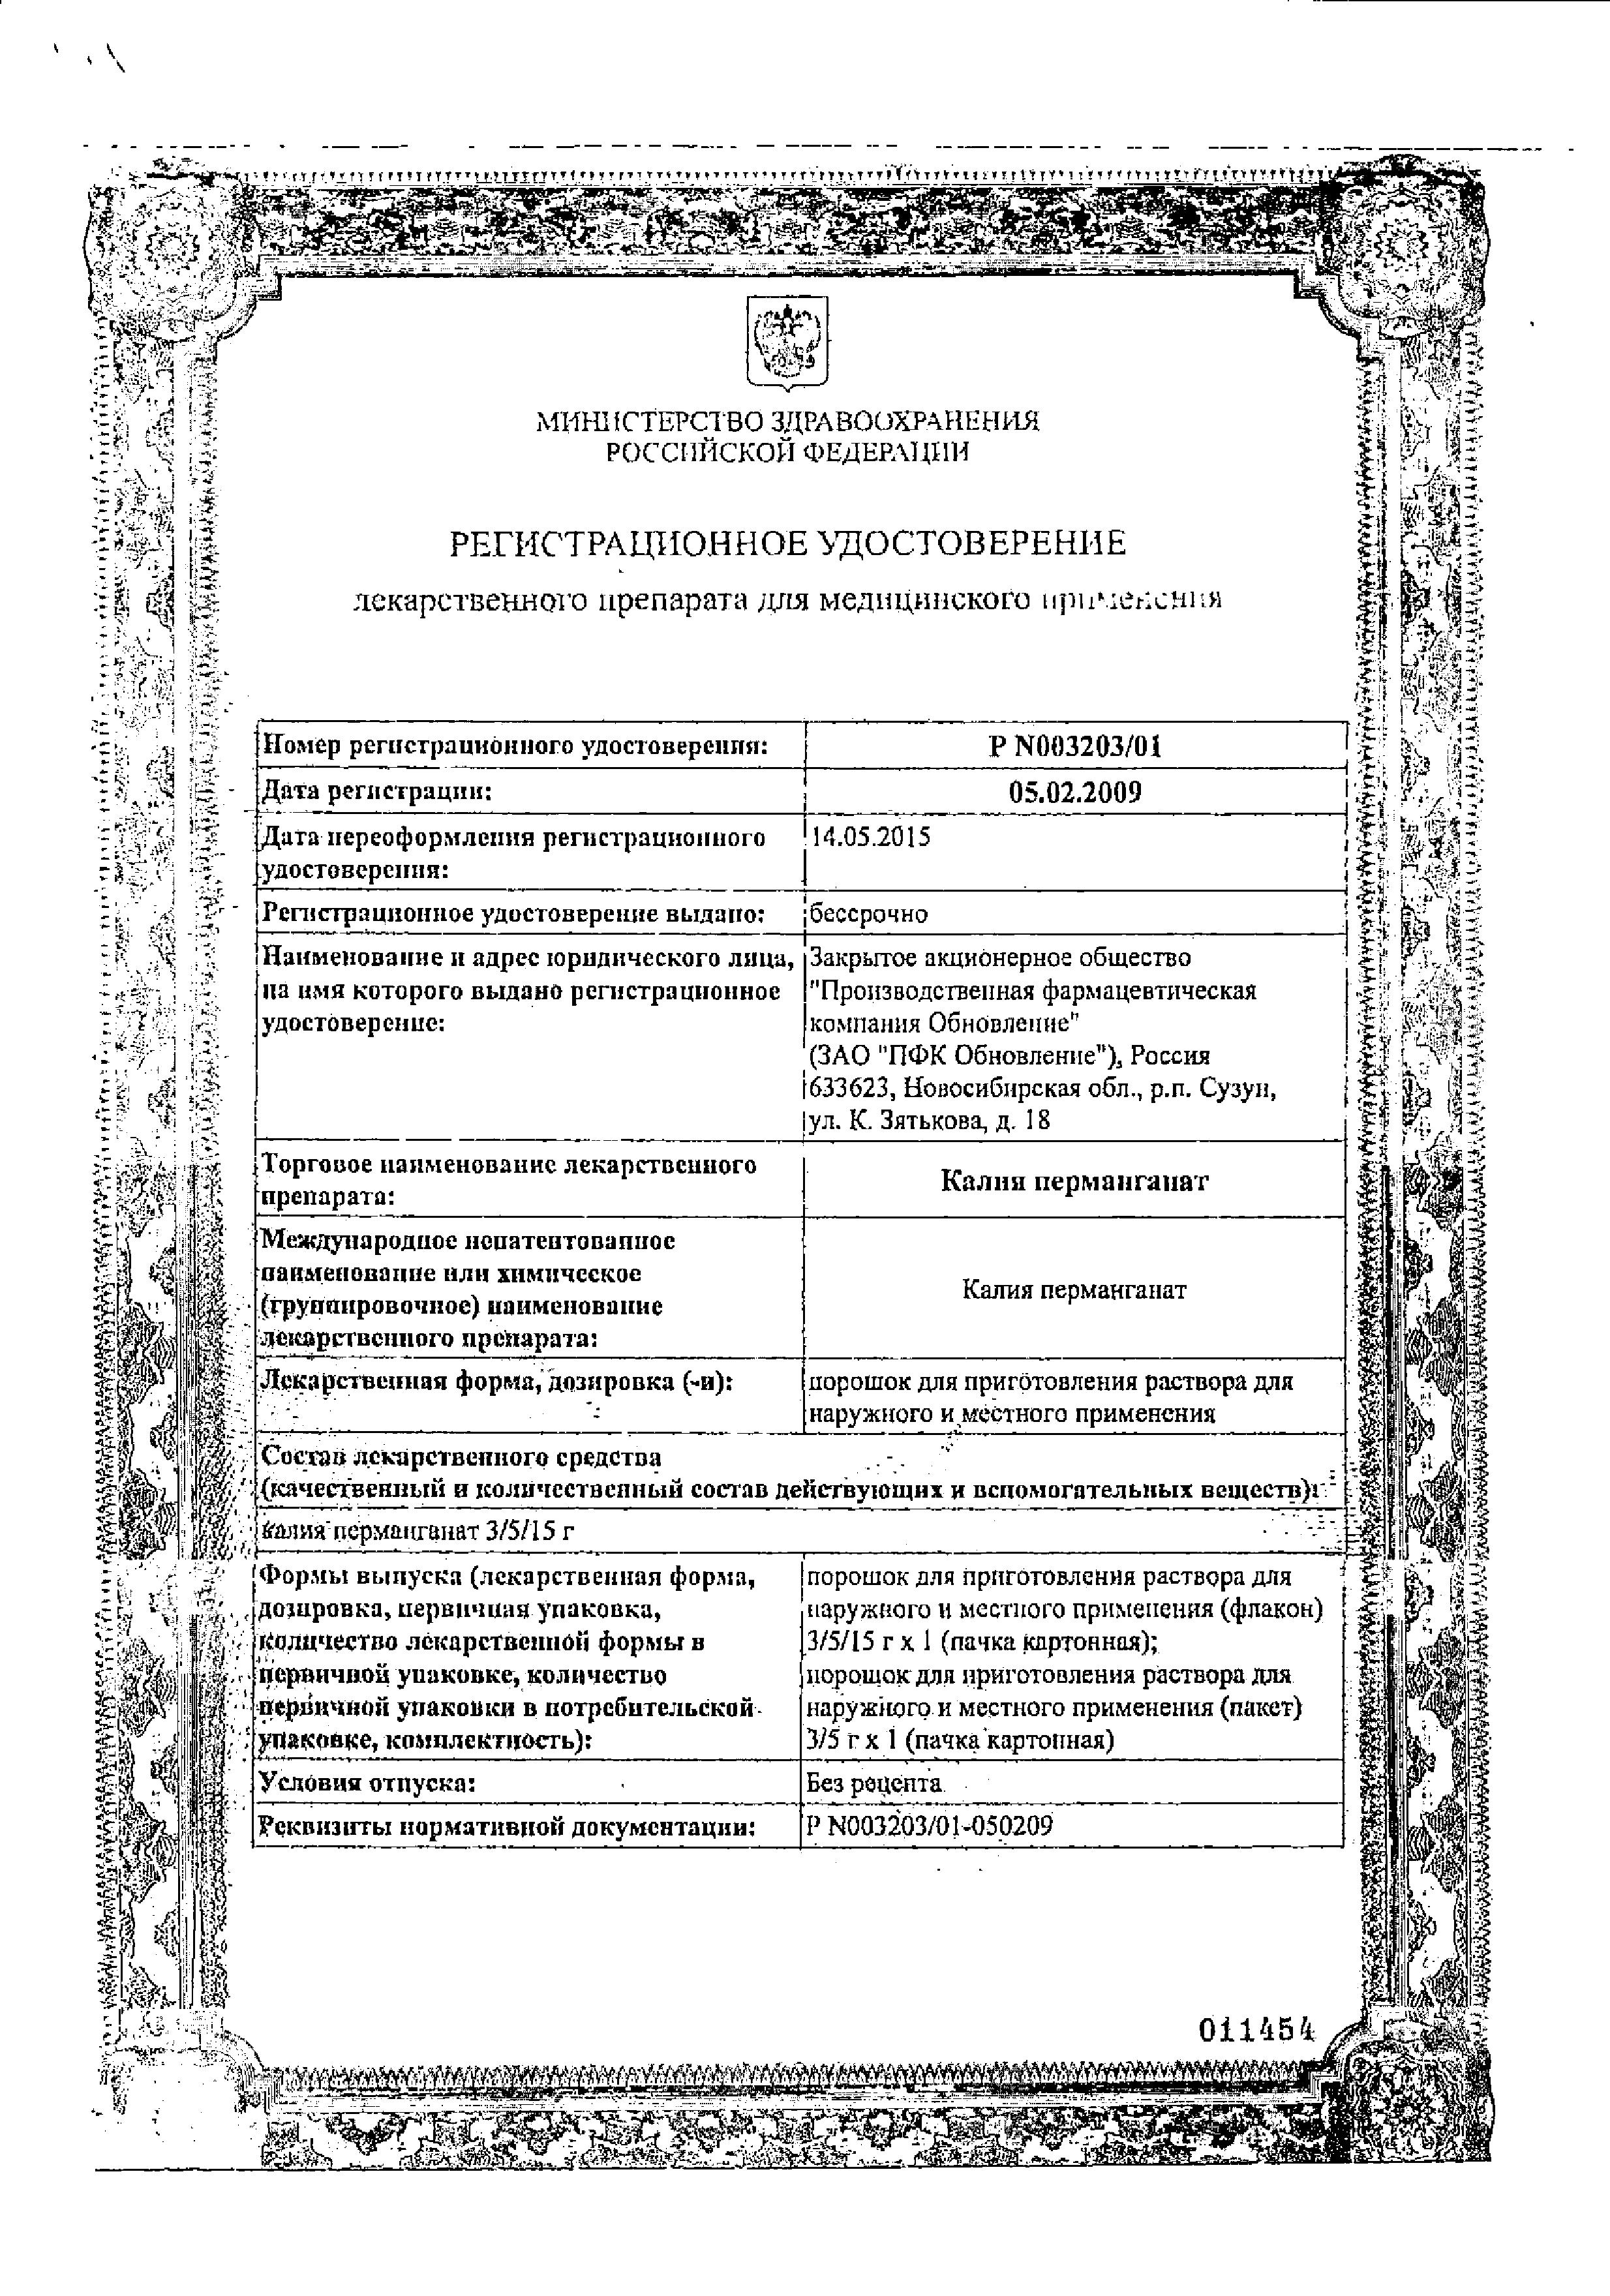 Калия перманганат сертификат